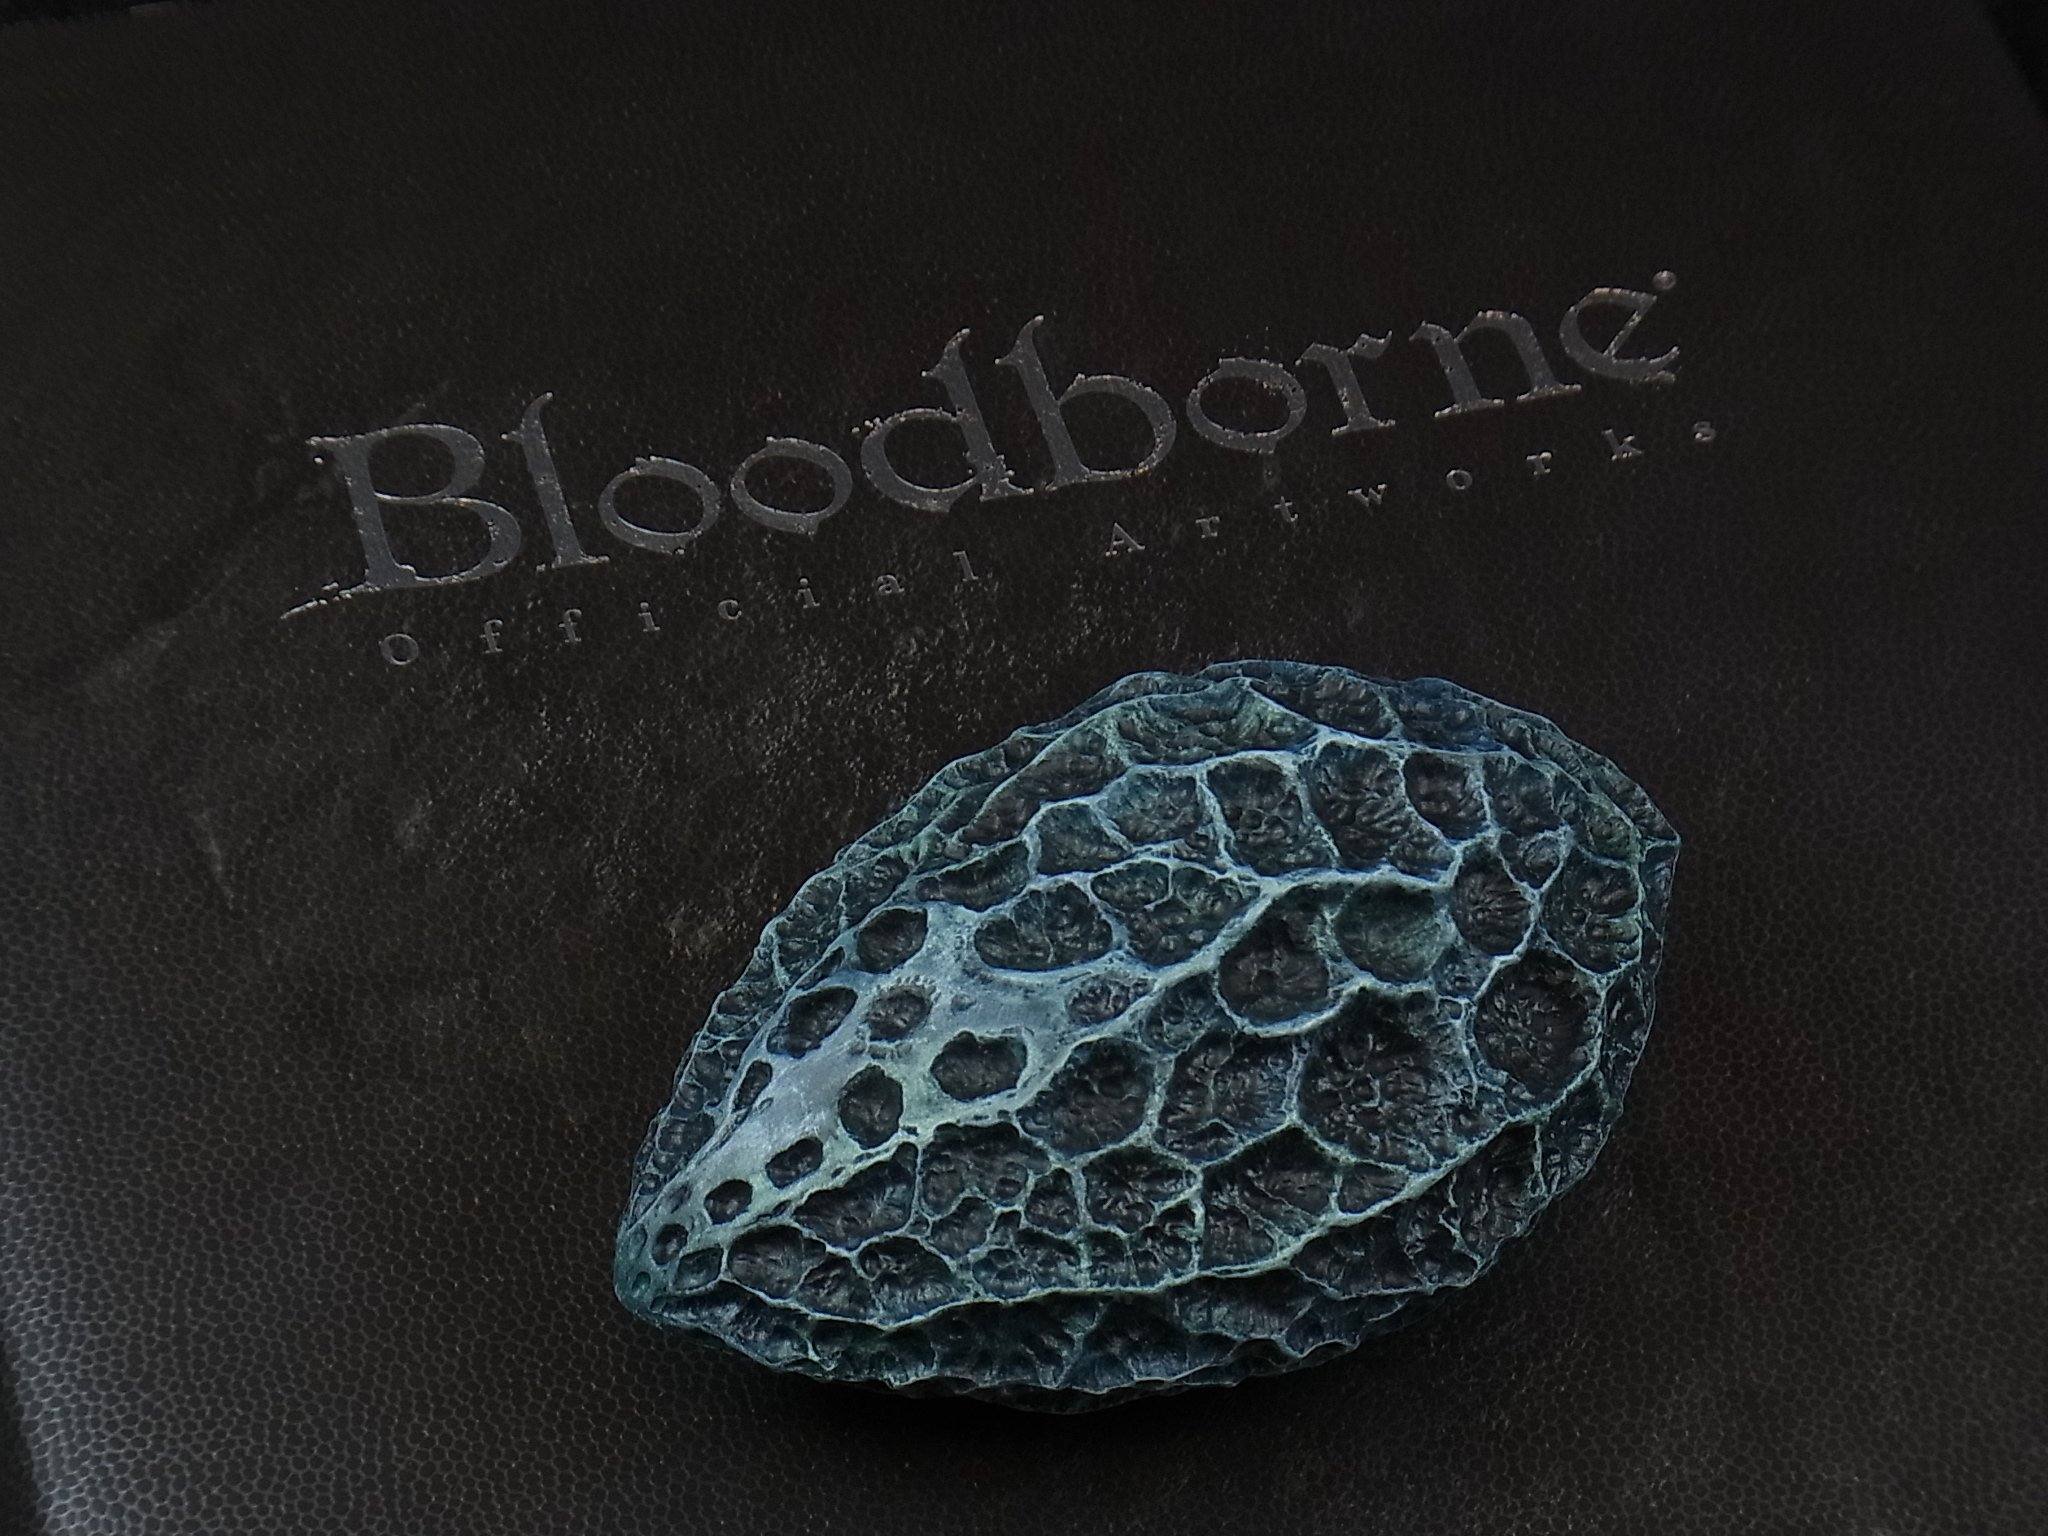 Bloodborne 扁桃石